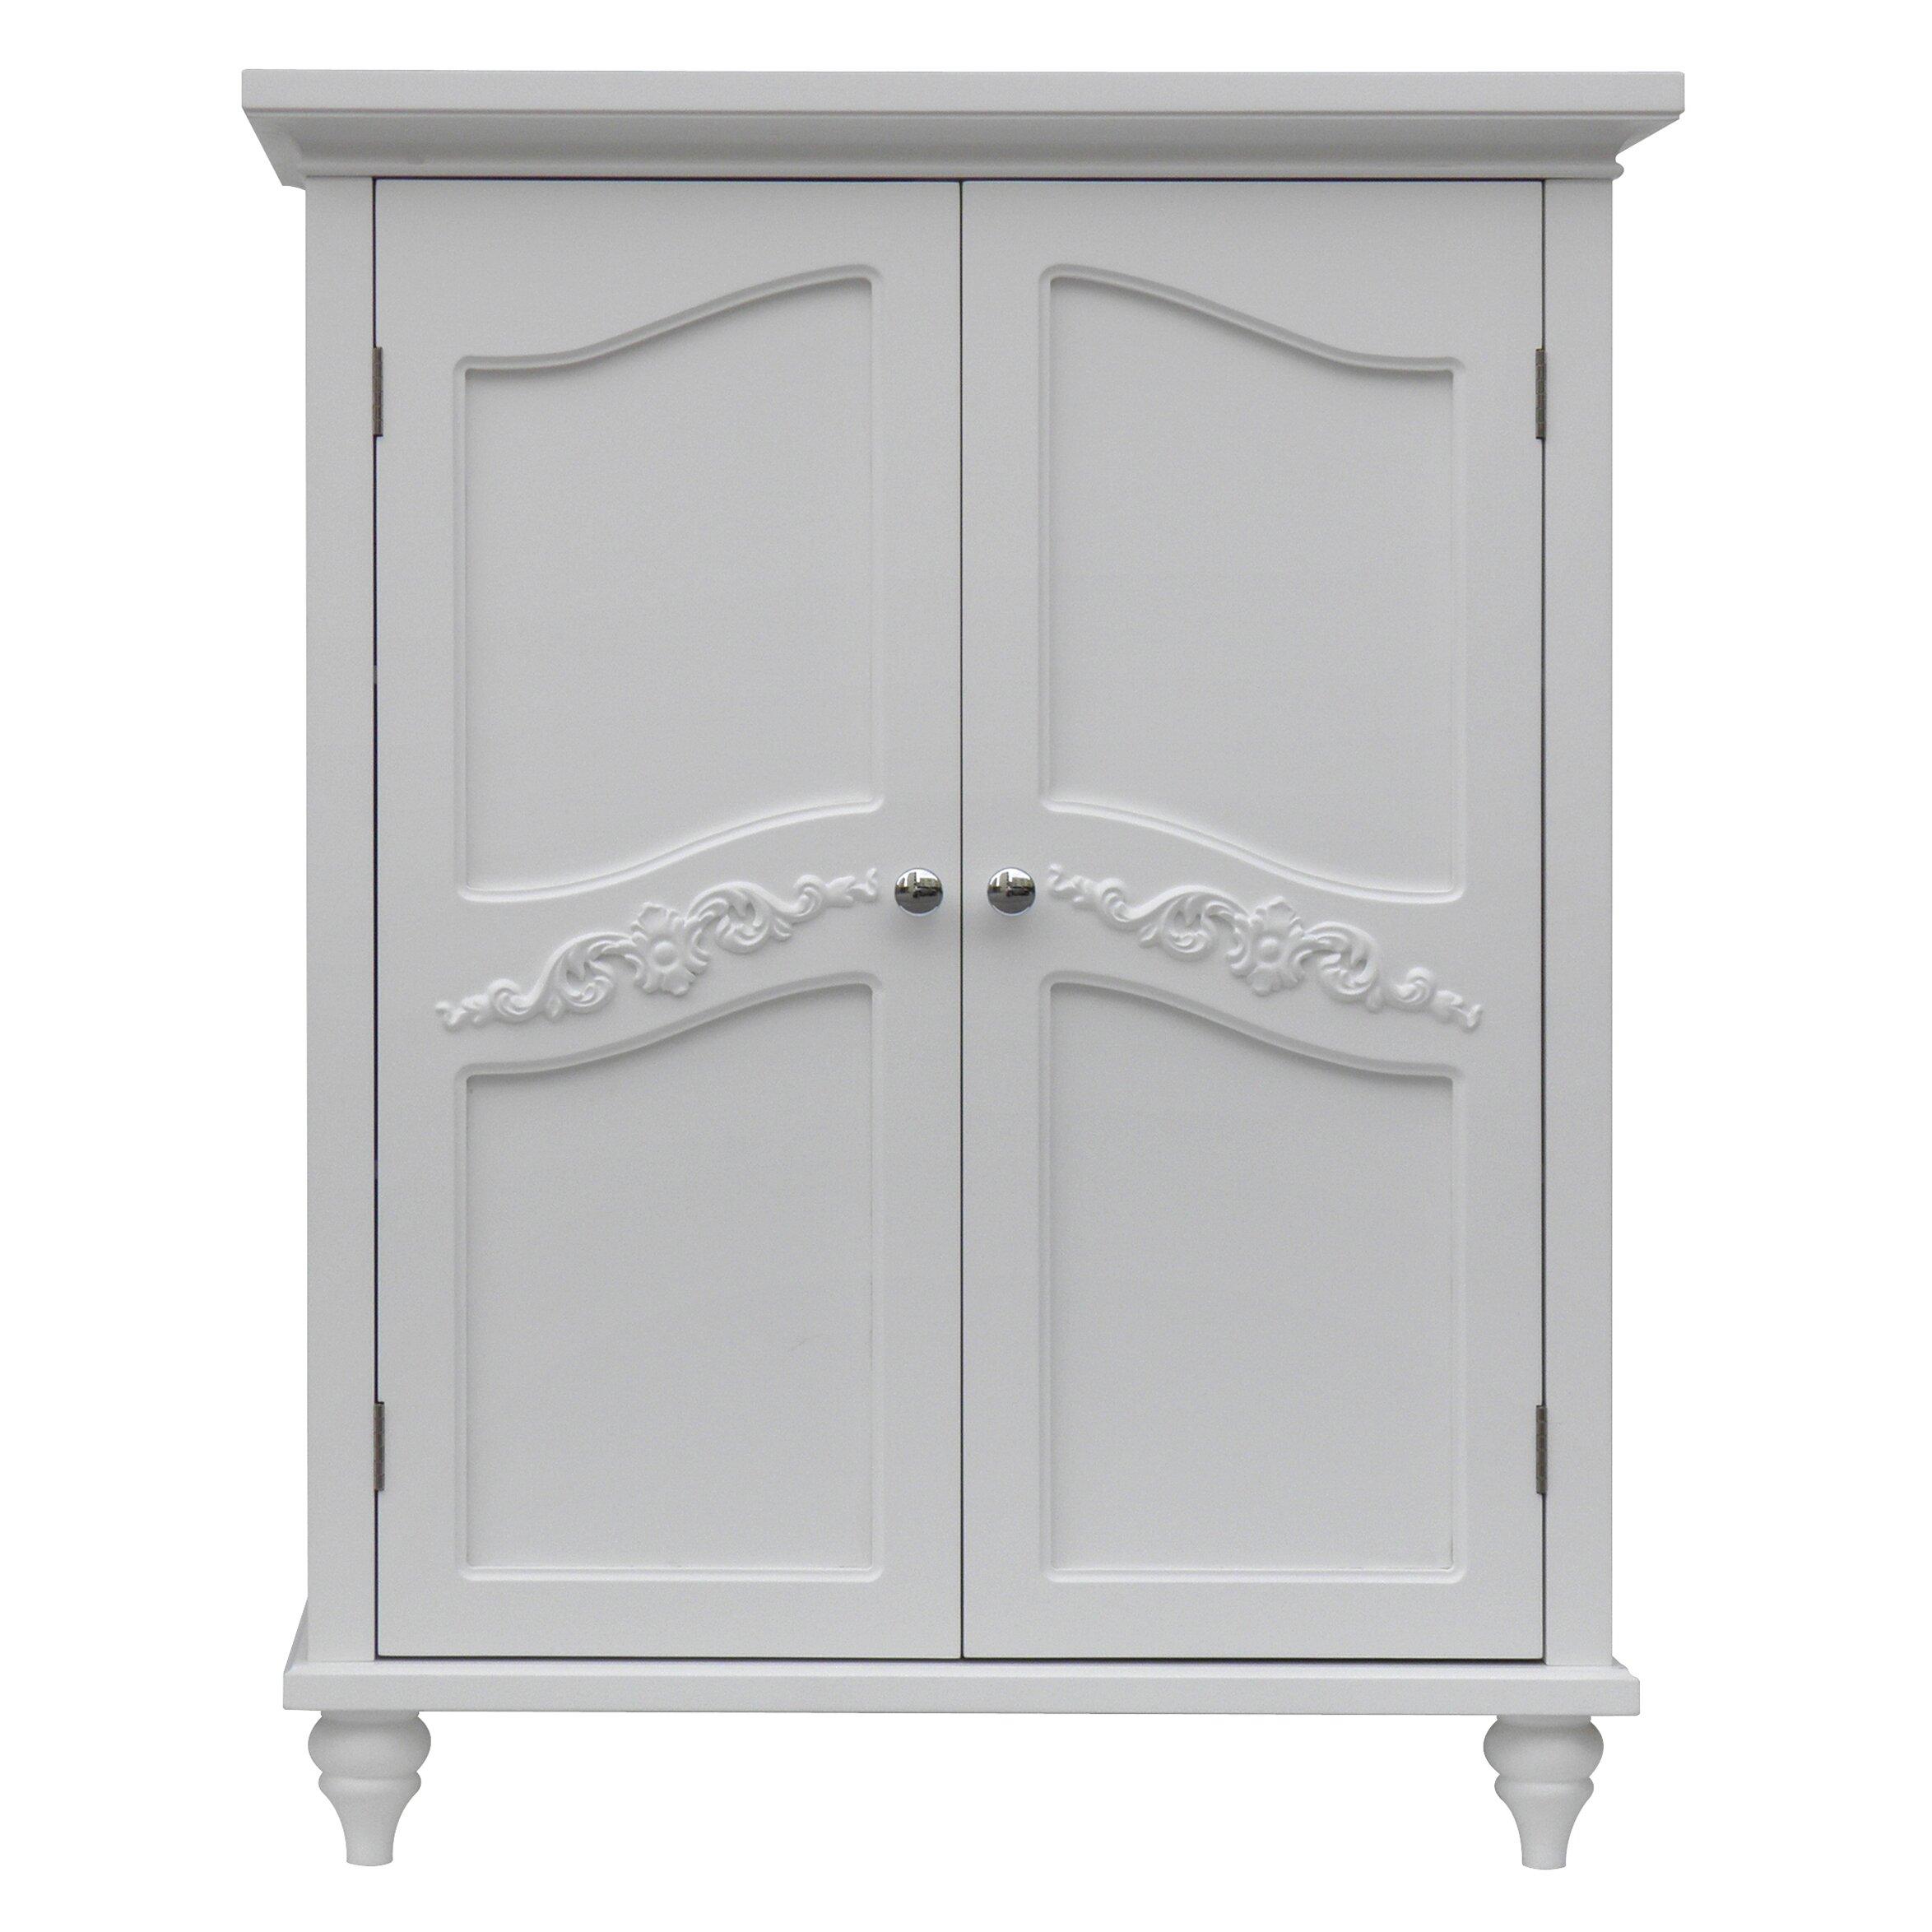 Elegant Home Fashions Versailles 27 quot  W x 34 quot. Elegant Home Fashions Versailles 27  W x 34  H Cabinet   Reviews